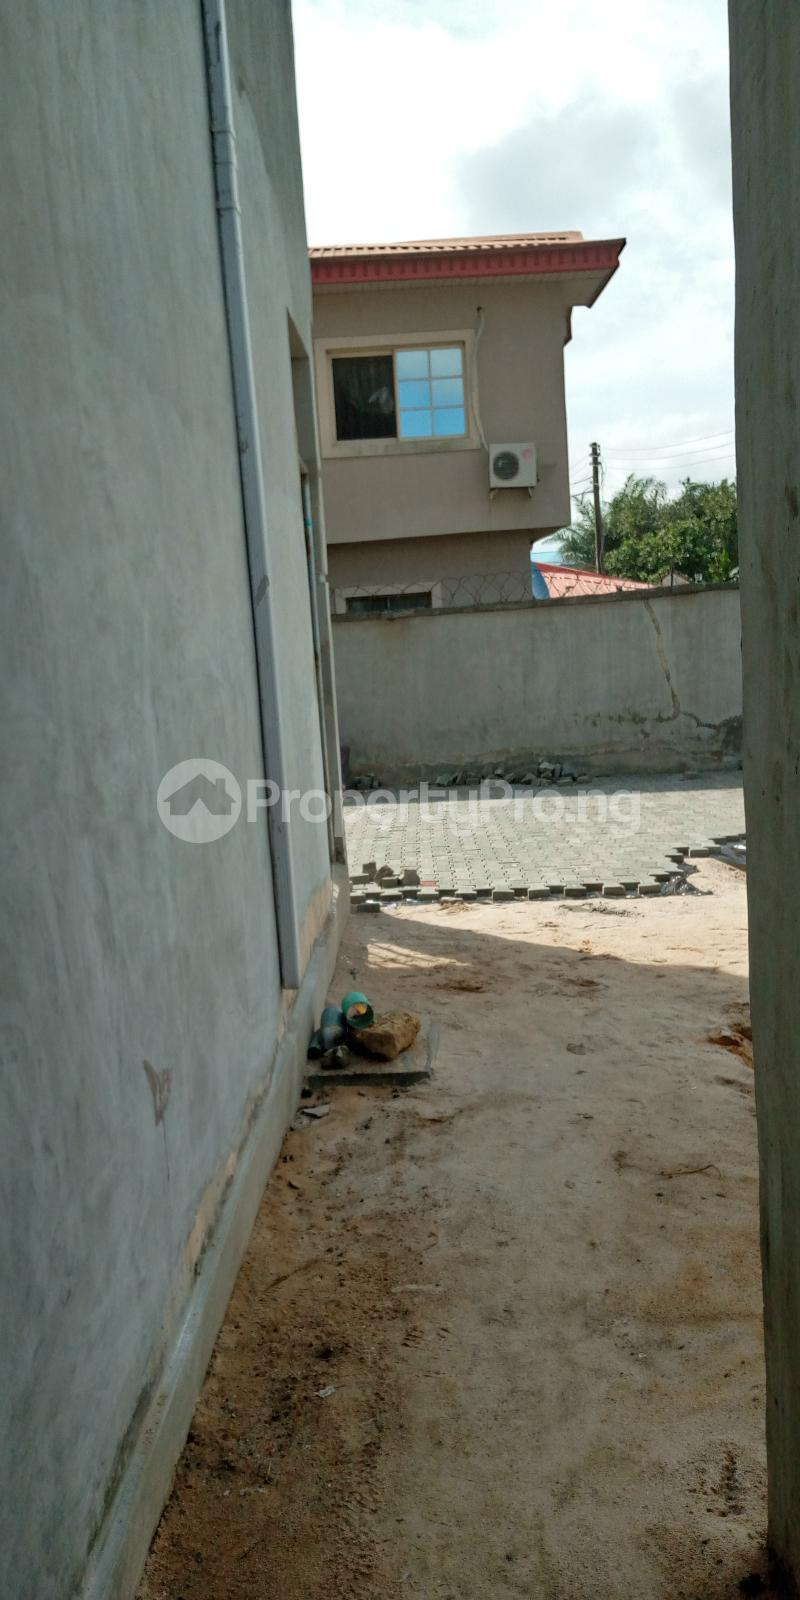 School Commercial Property for sale Eputu Ibeju-Lekki Lagos - 9